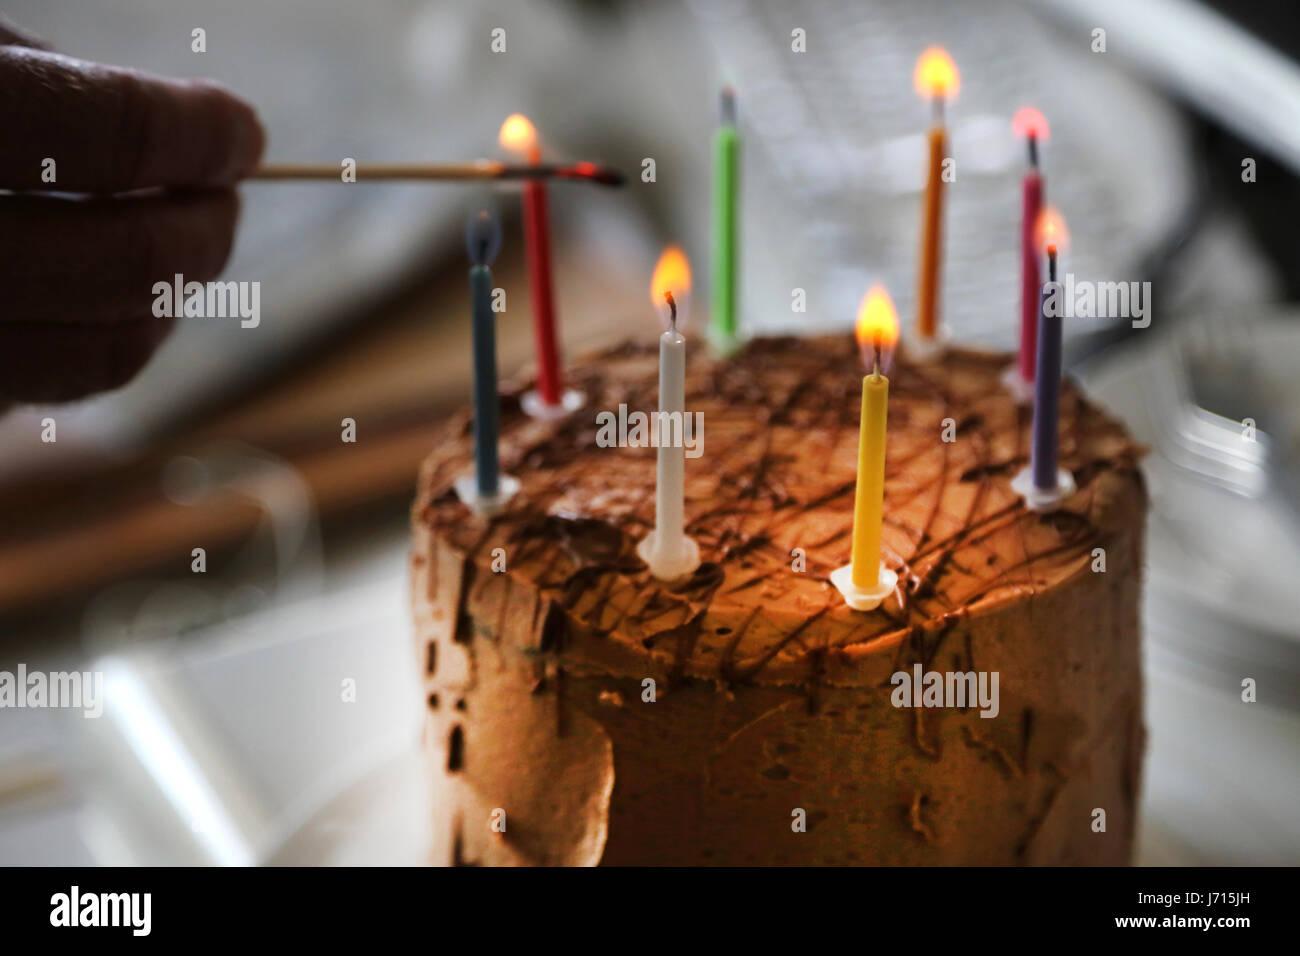 Lighting candles on chocolate birthday cake - Stock Image